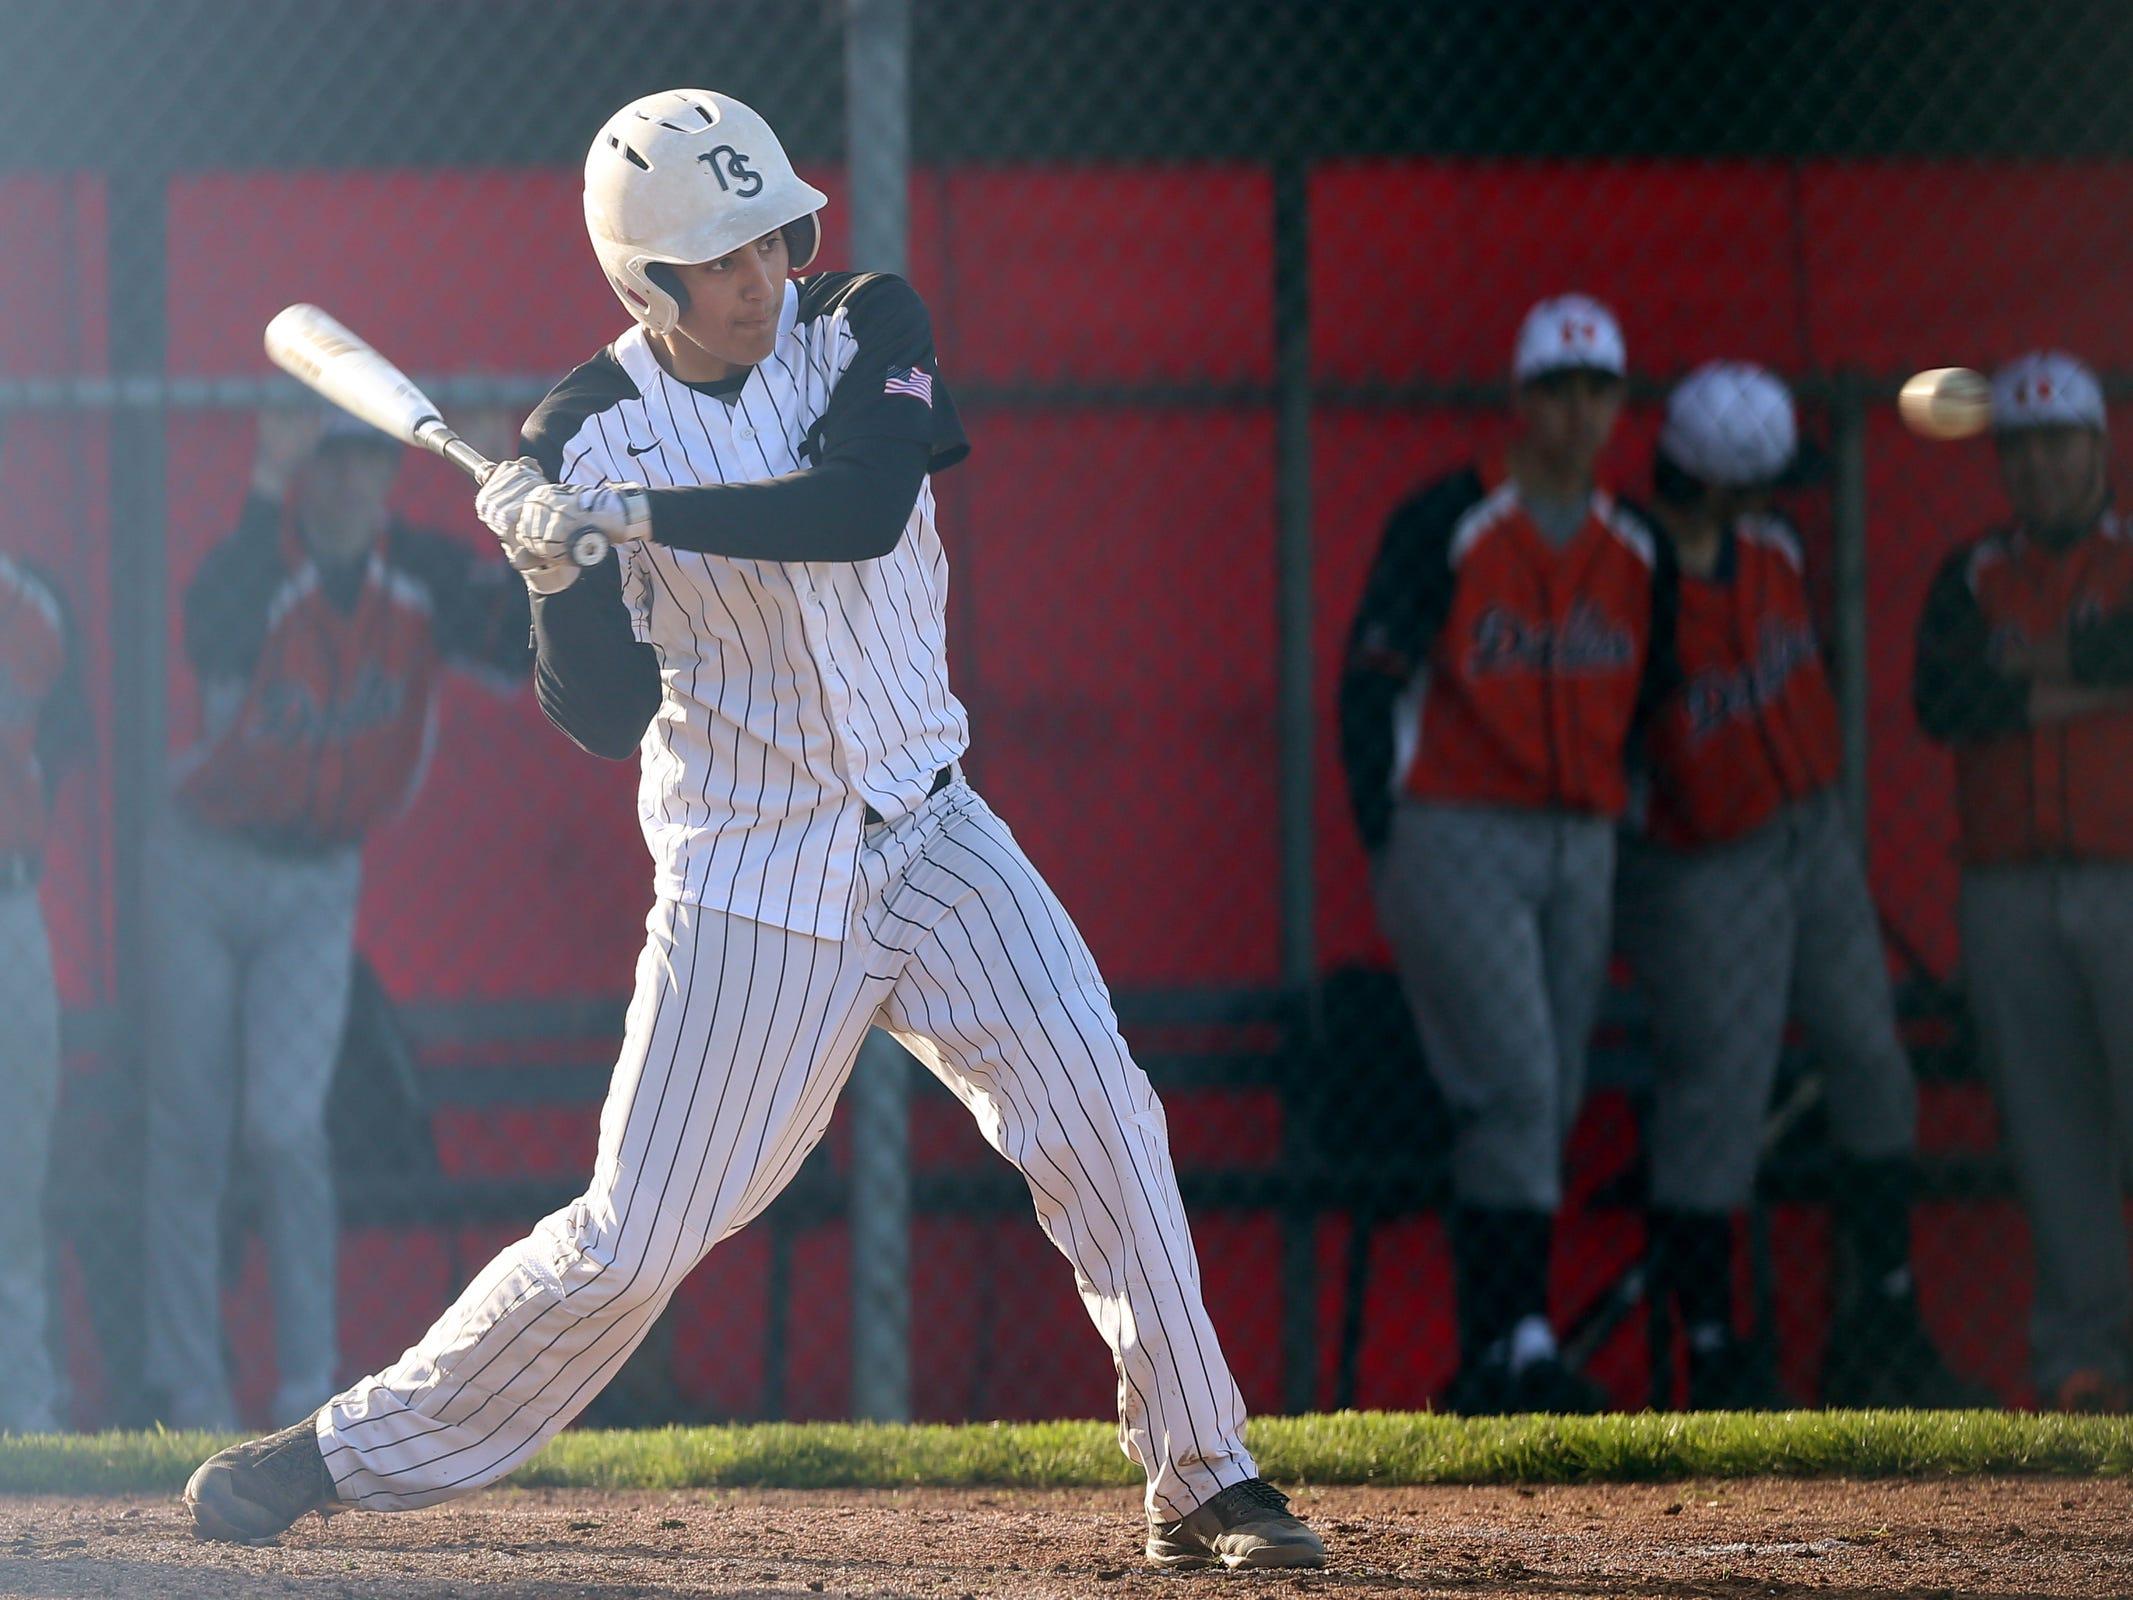 North Salem's Dylan Ebbs (14) bats in the Dallas vs. North Salem baseball game in Salem on April 12, 2019.